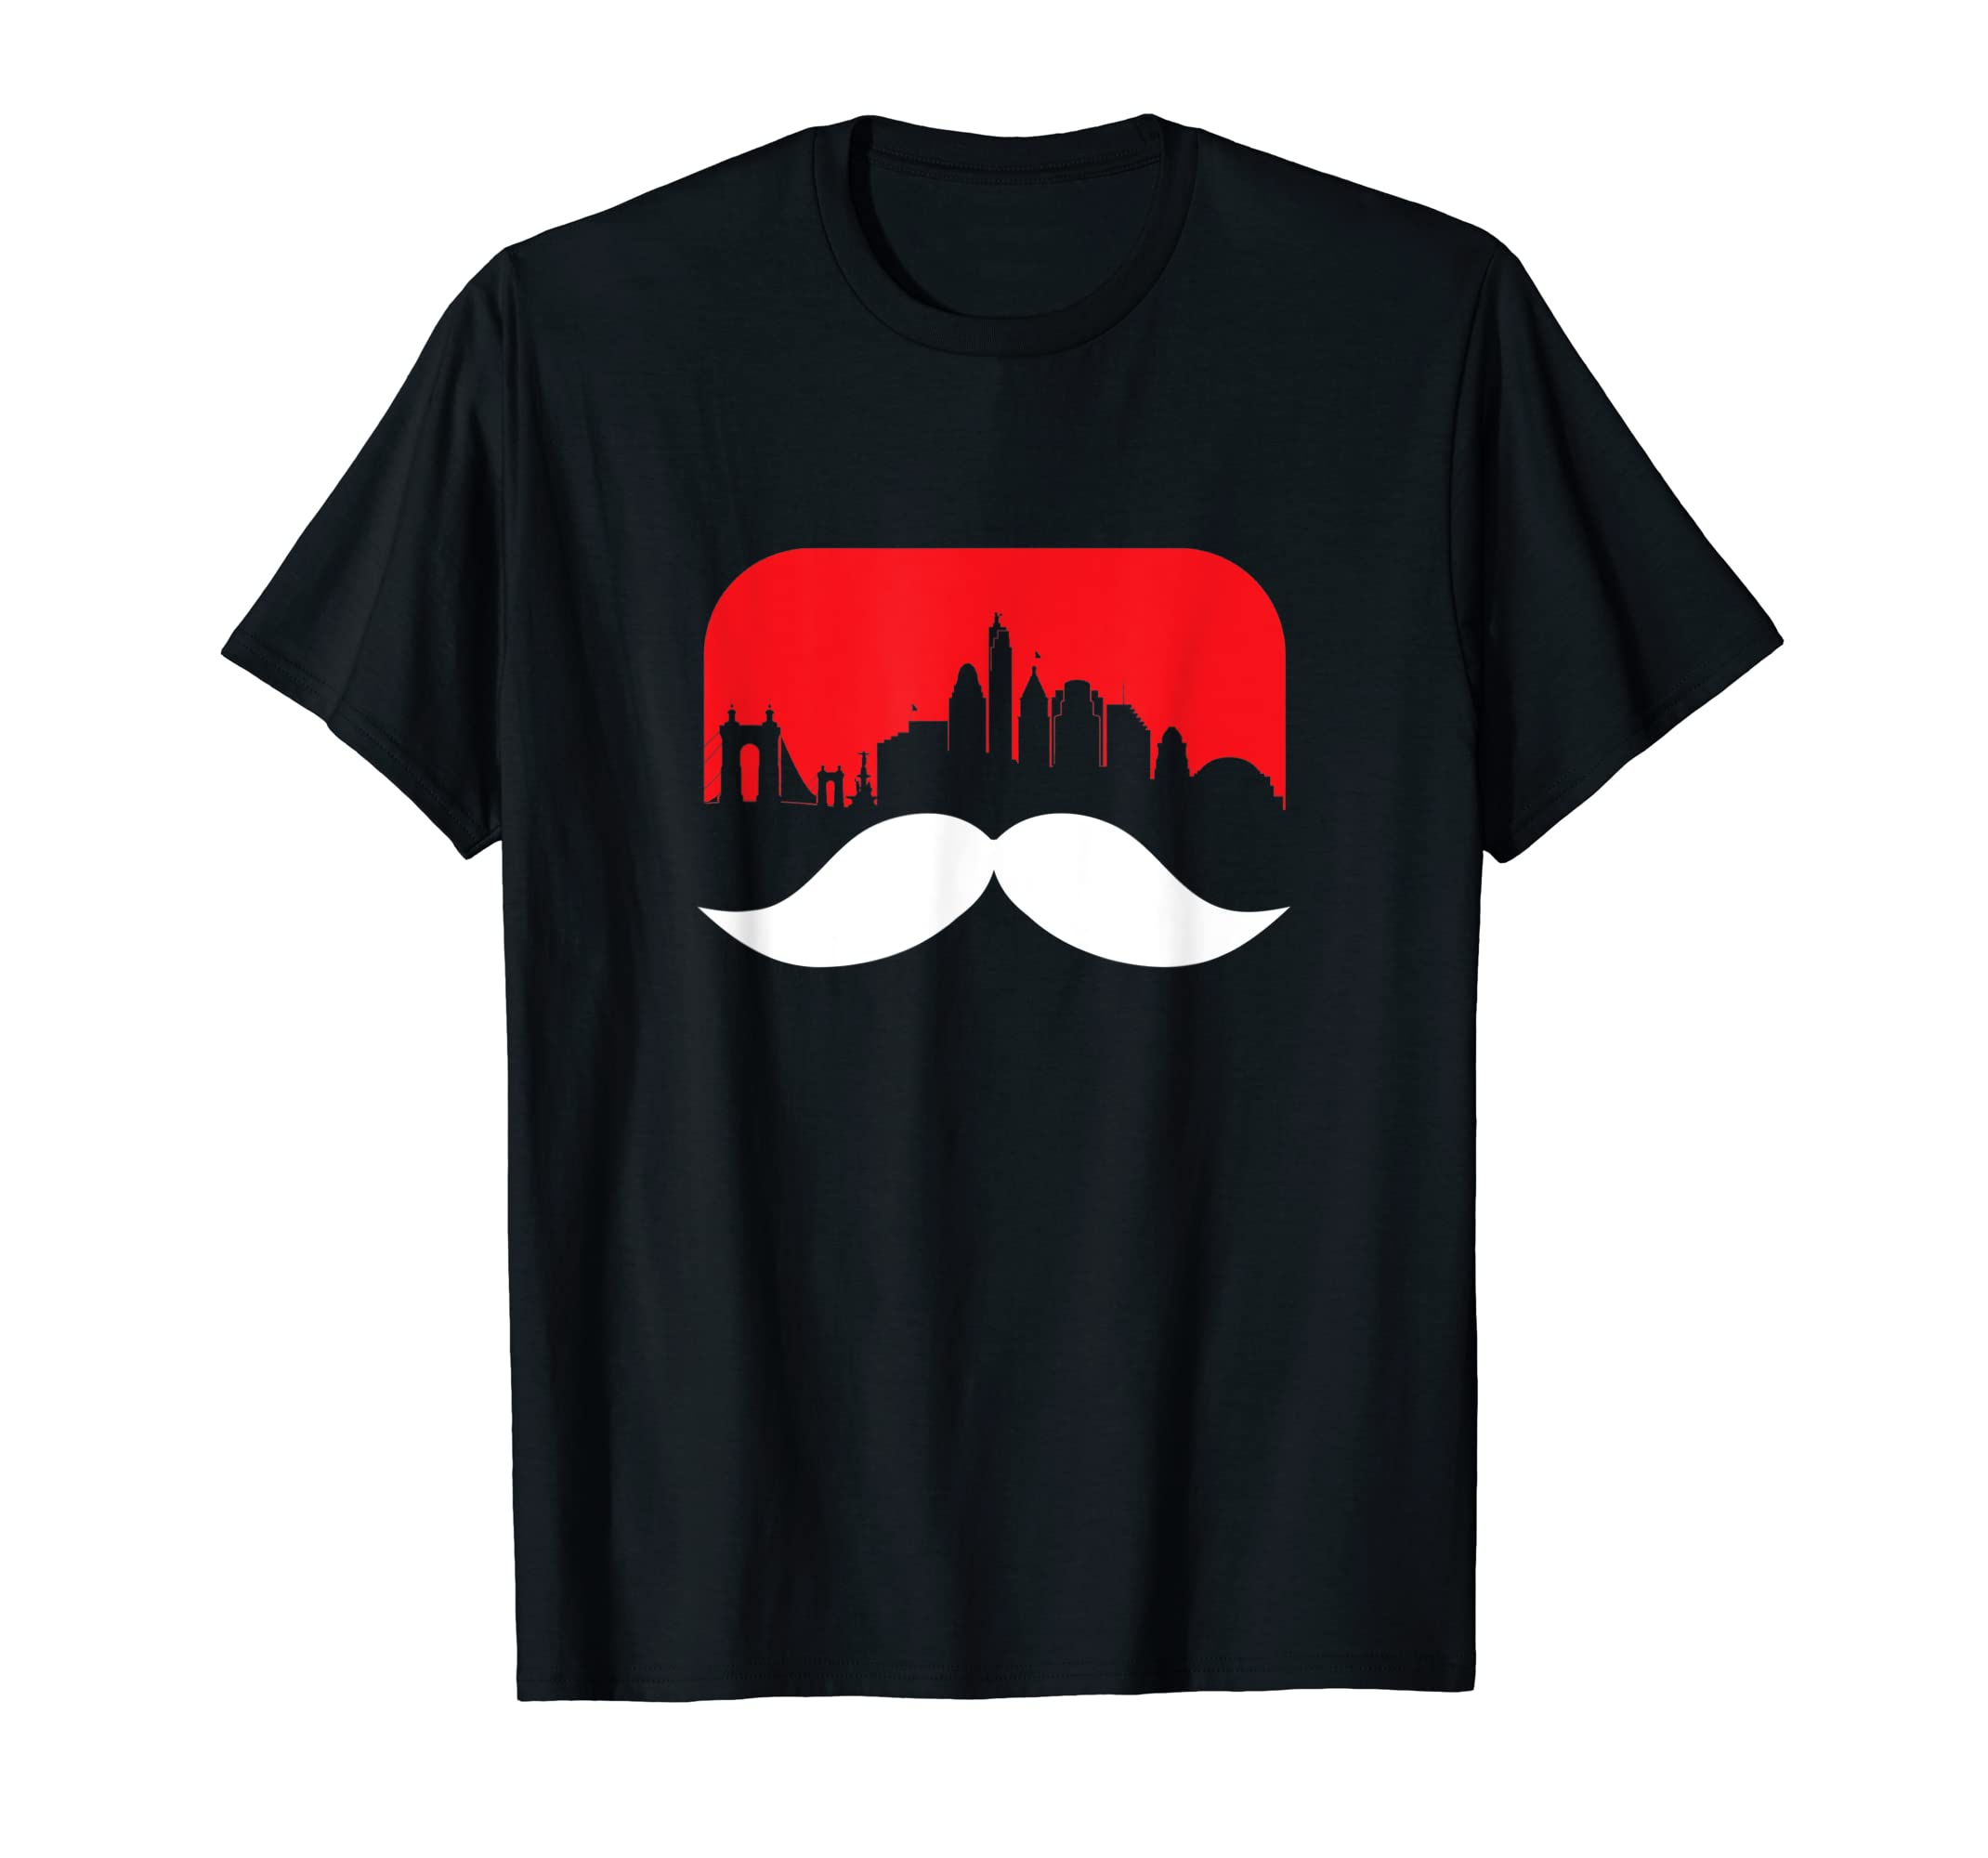 Cincinnati Moustache Shirt & Red Cincinnati Skyline Redlegs-Loveshirt